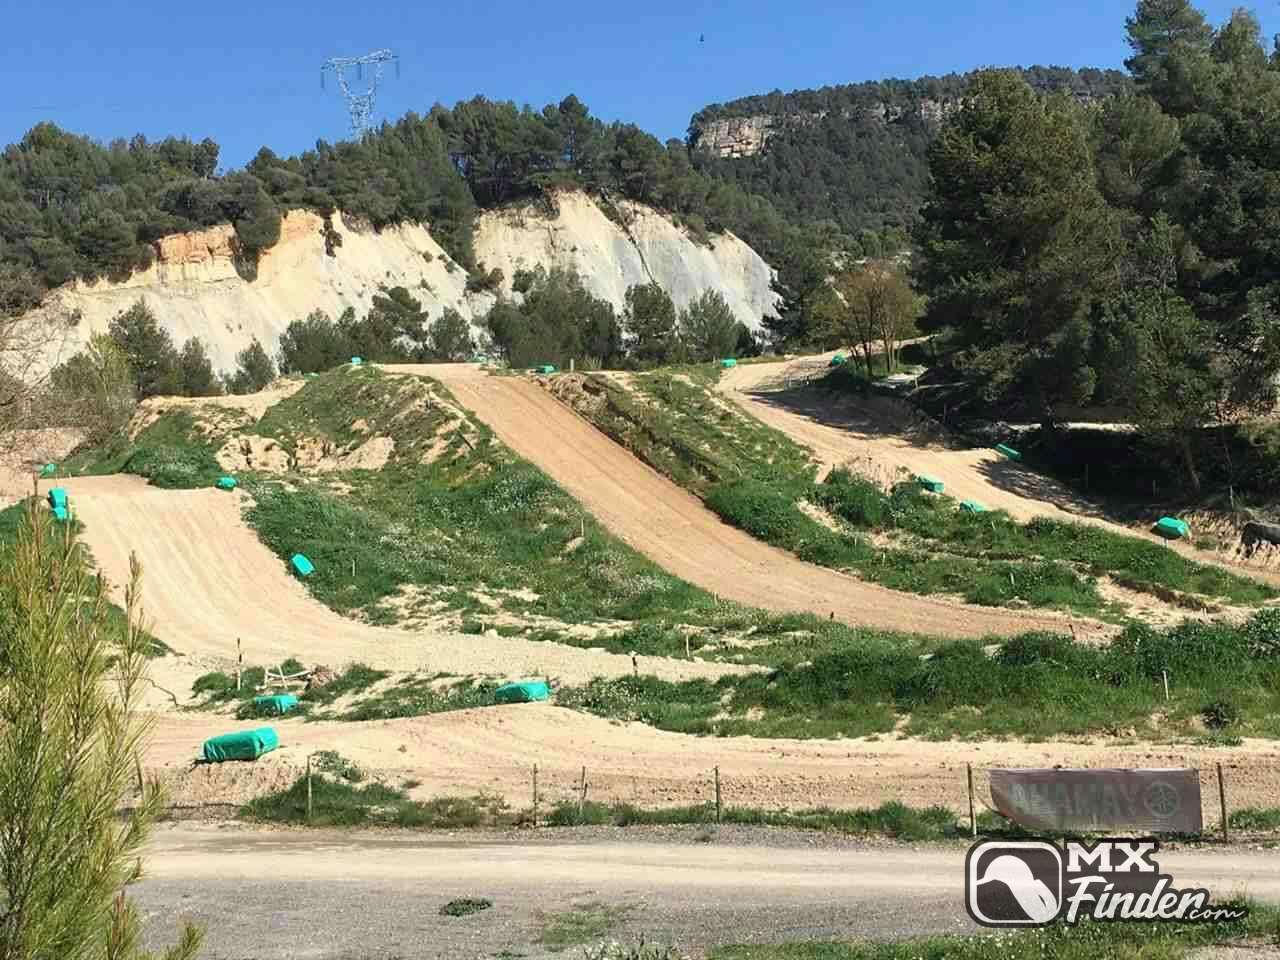 motocross, Parcmotor Castellolí, Castellolí, motocross track